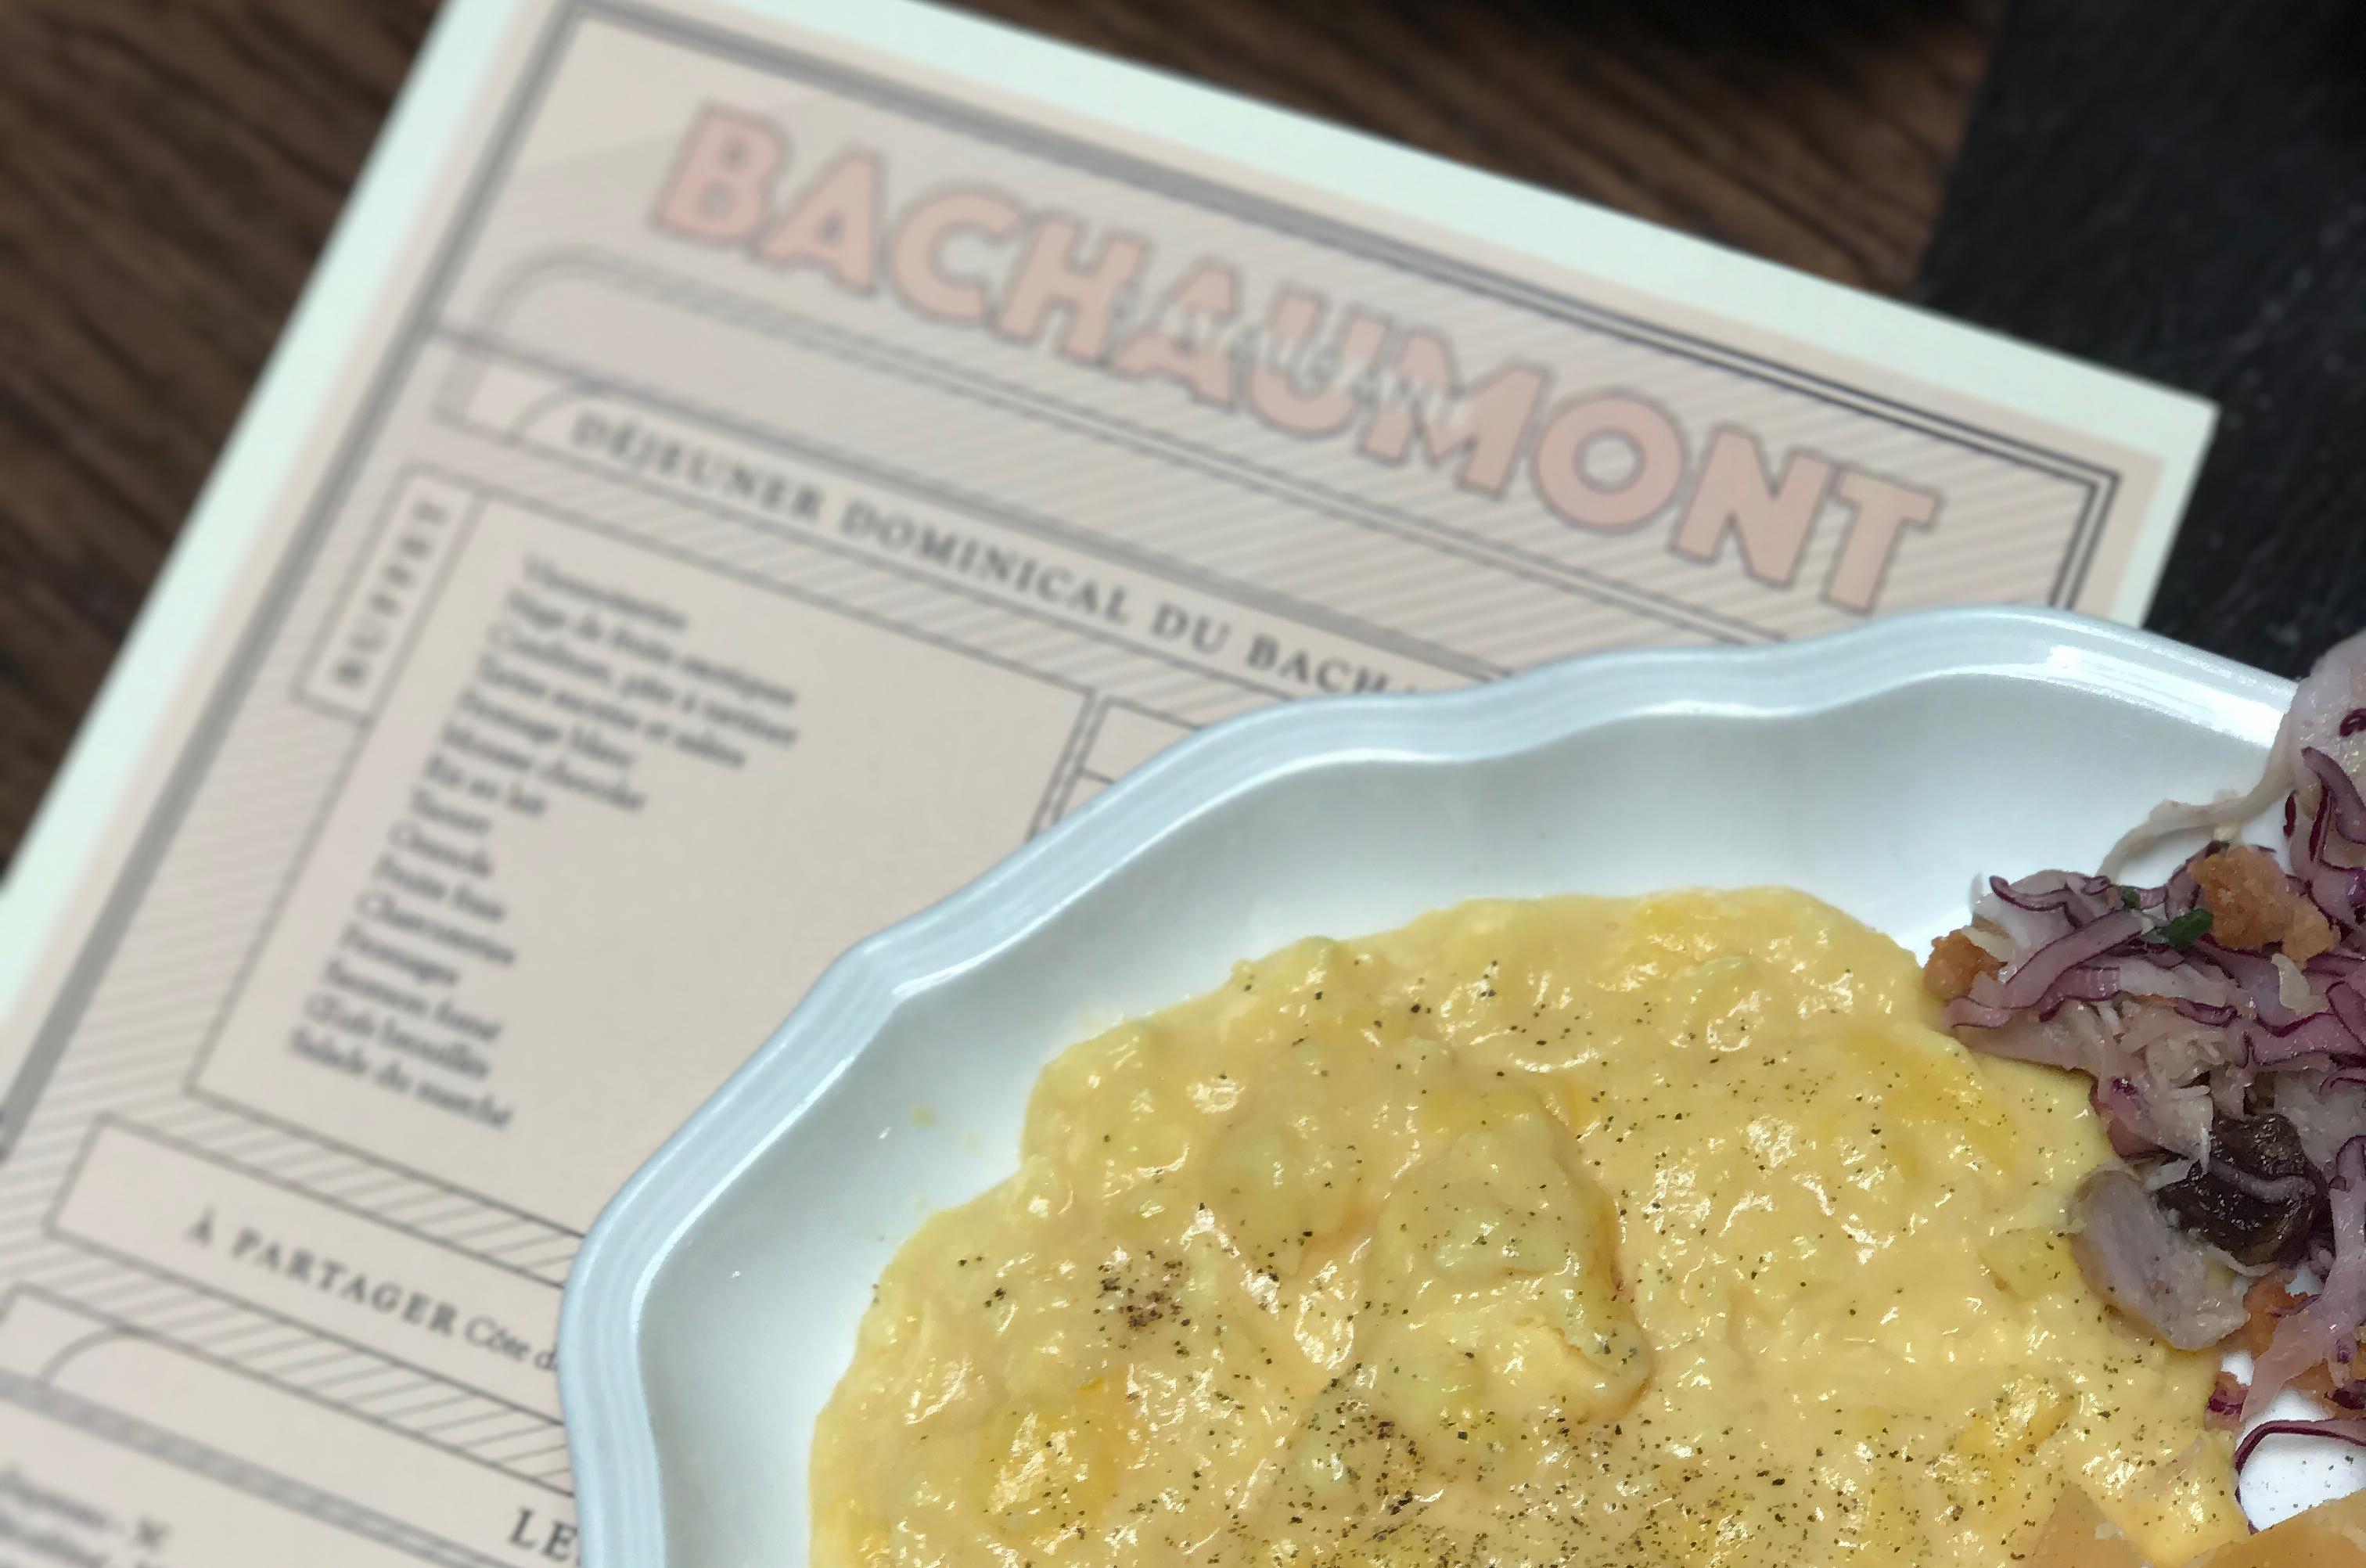 Bachaumont-02